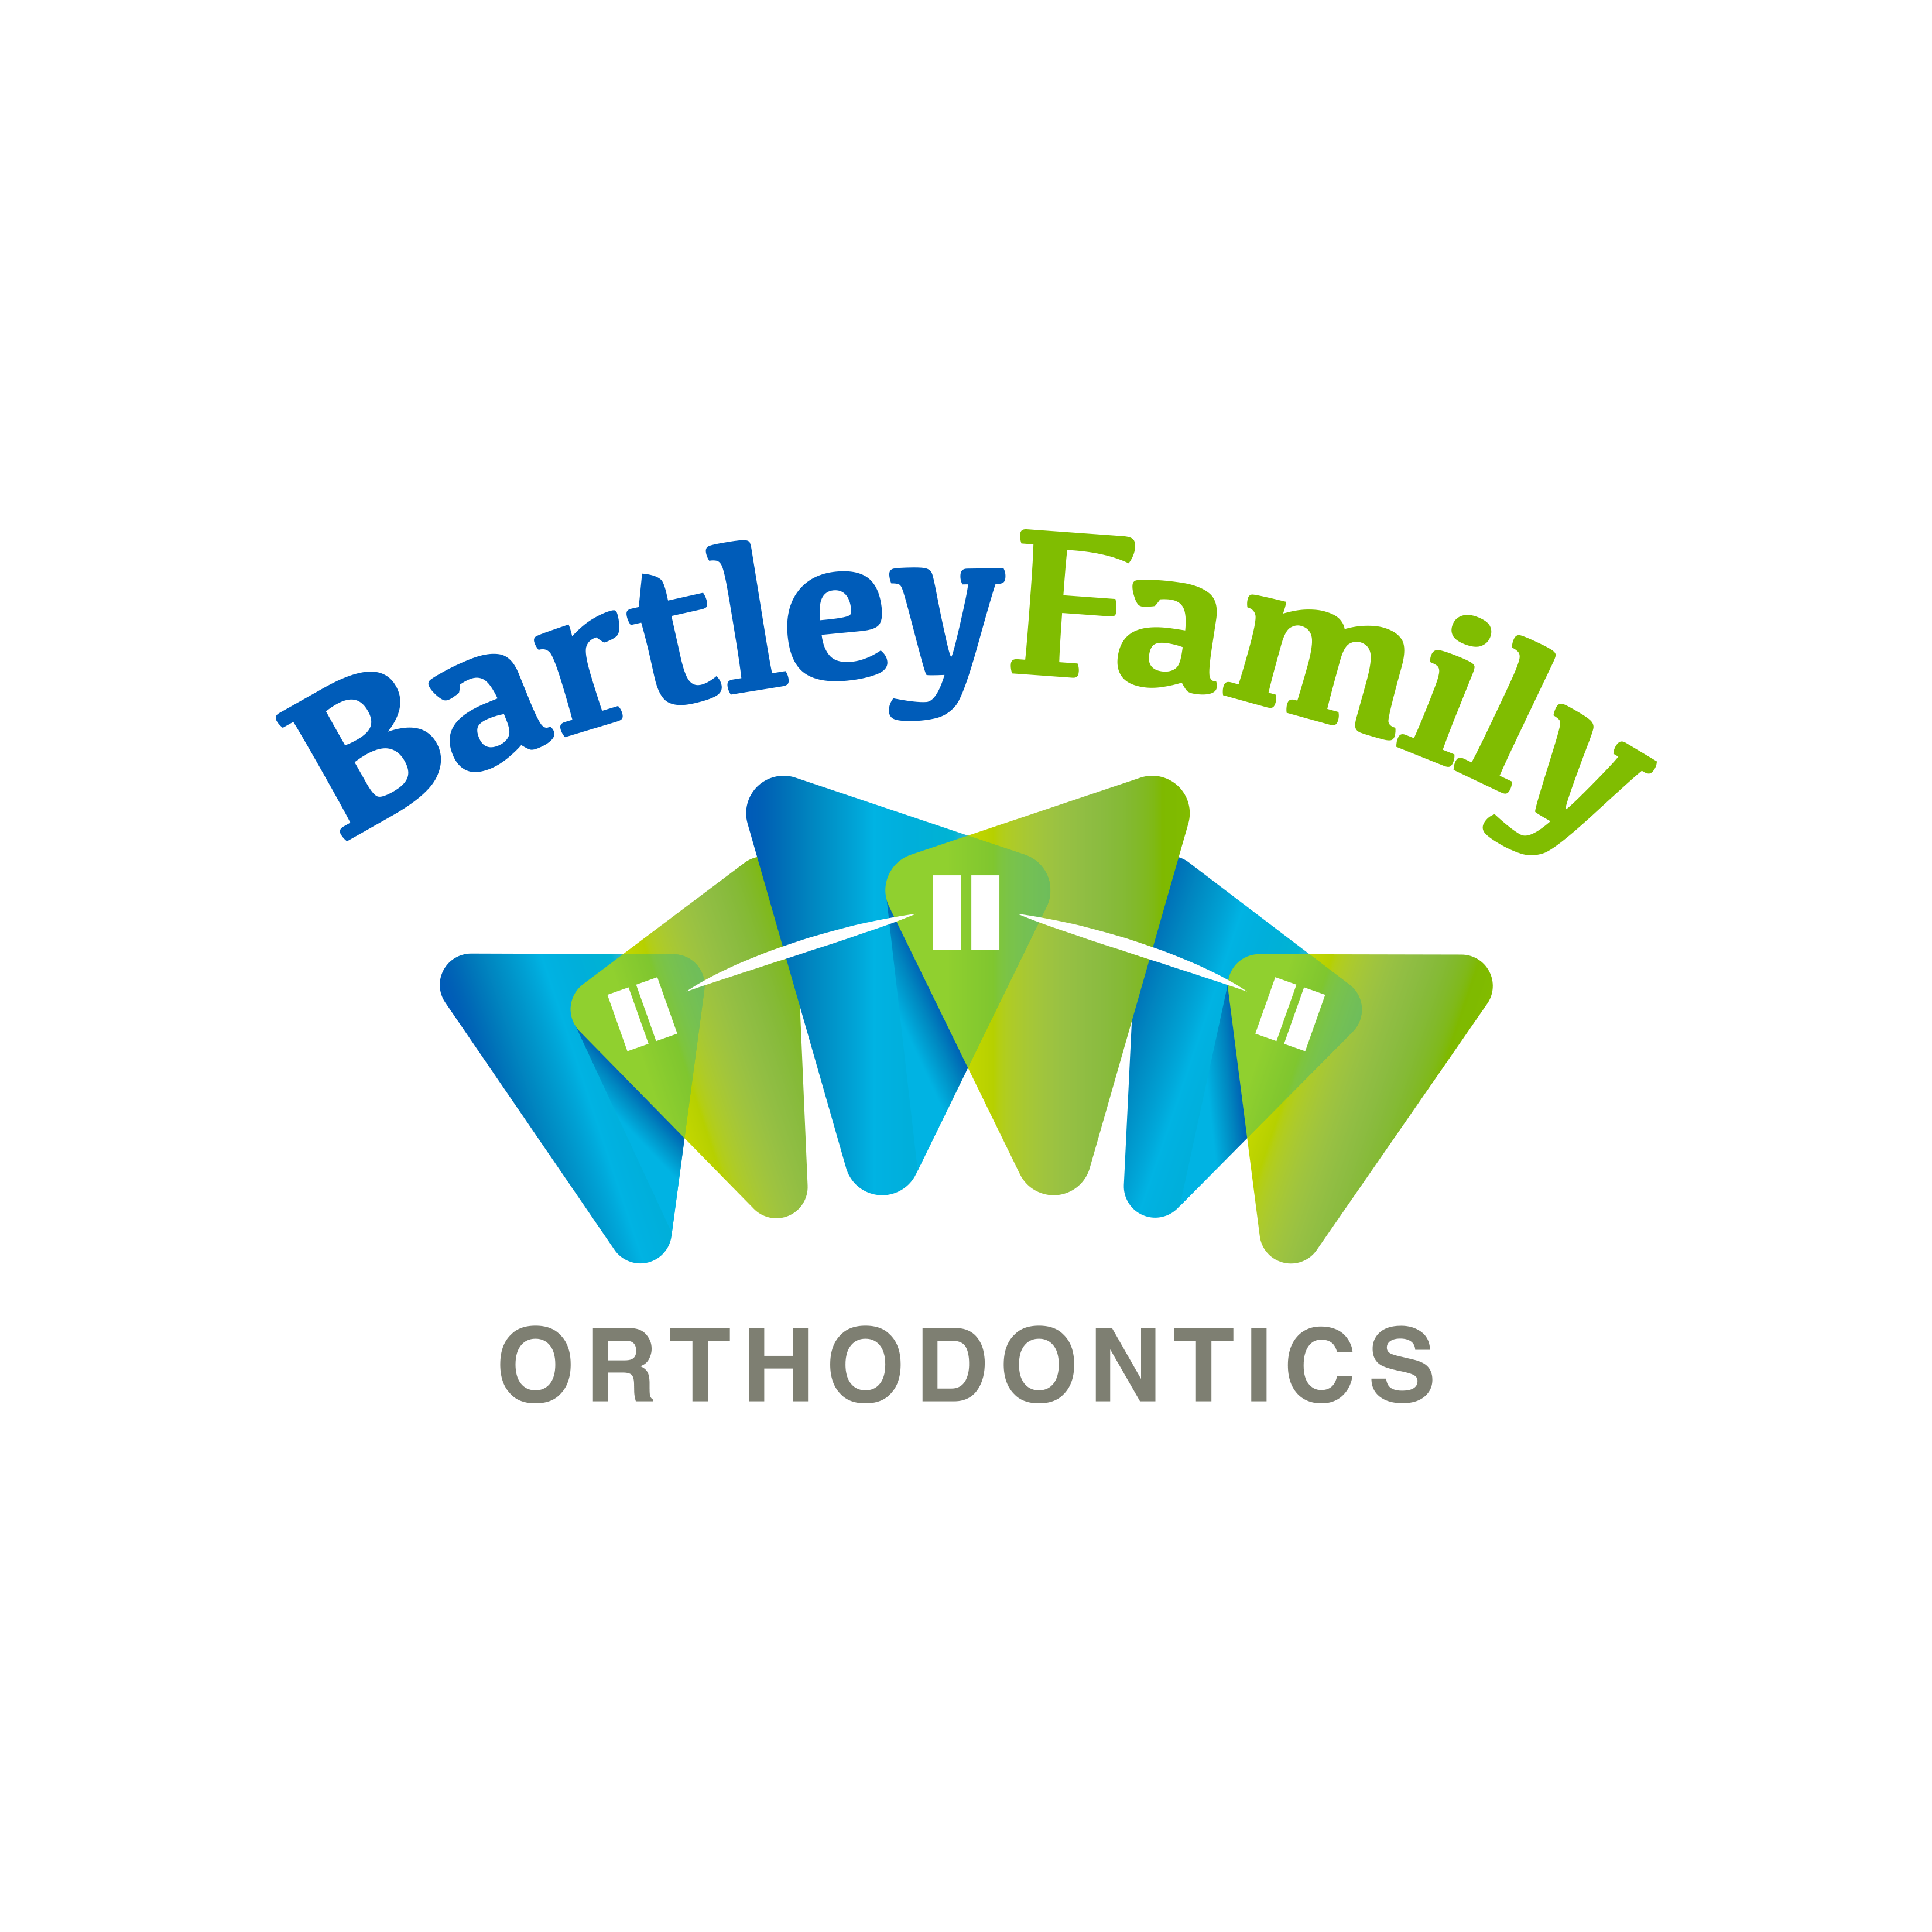 Bartley Family Orthodontics